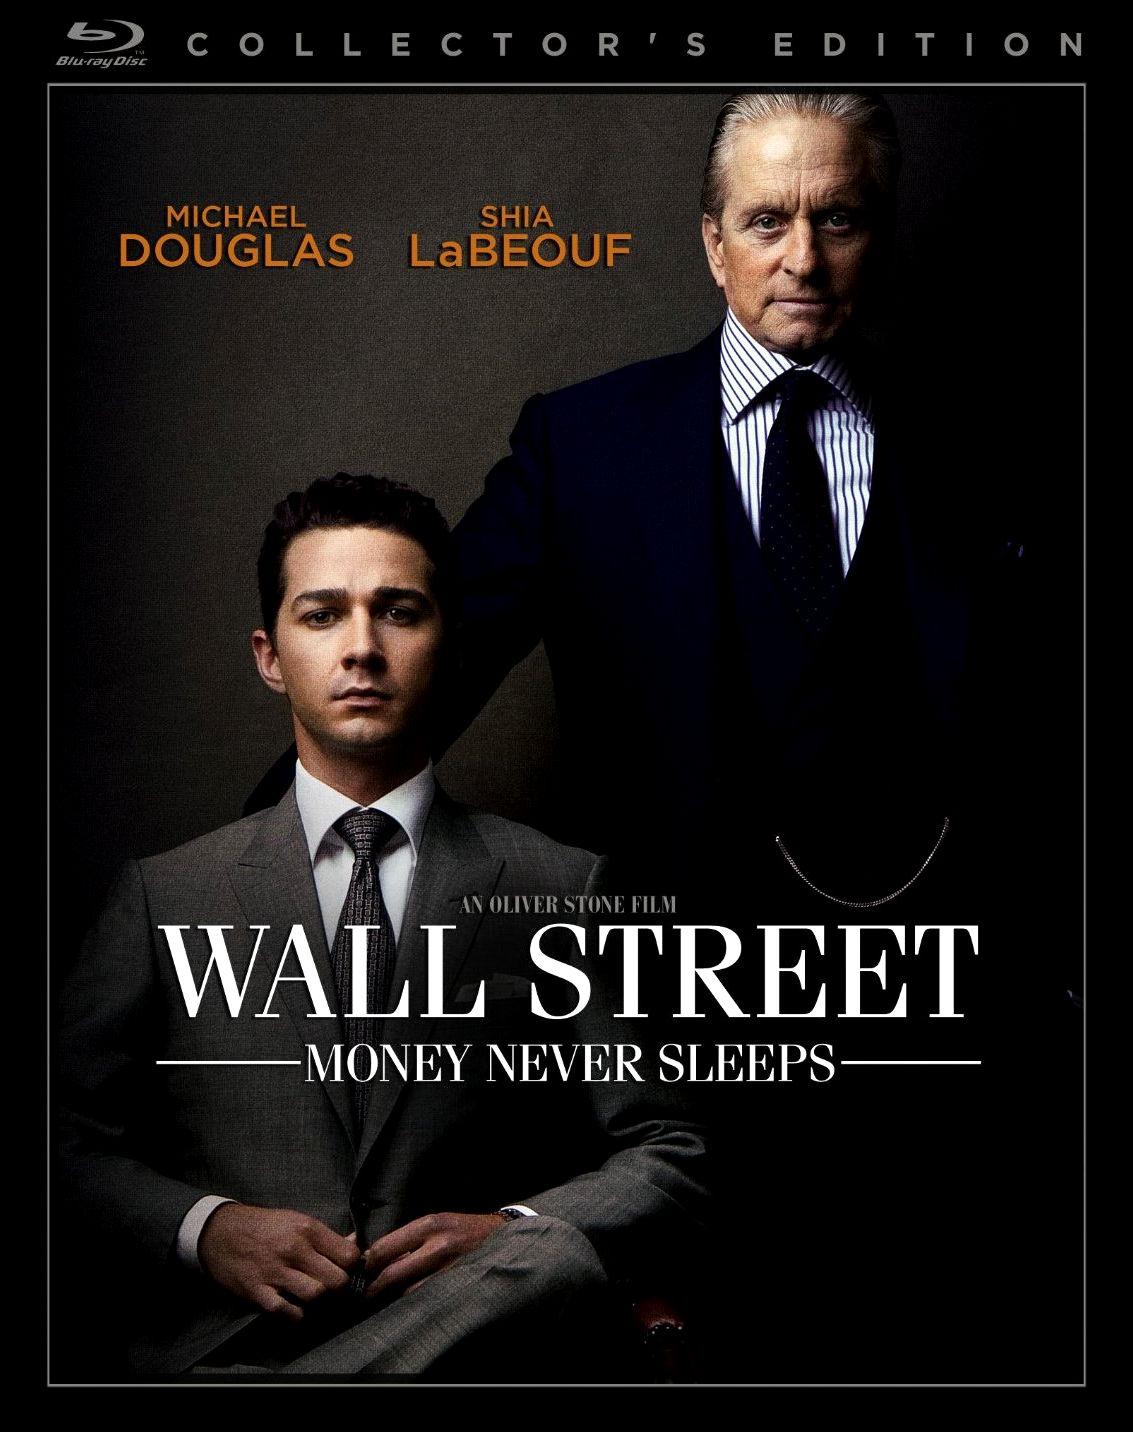 Уолл Стрит: Деньги не спят. Постер с сайта kinopoisk.ru